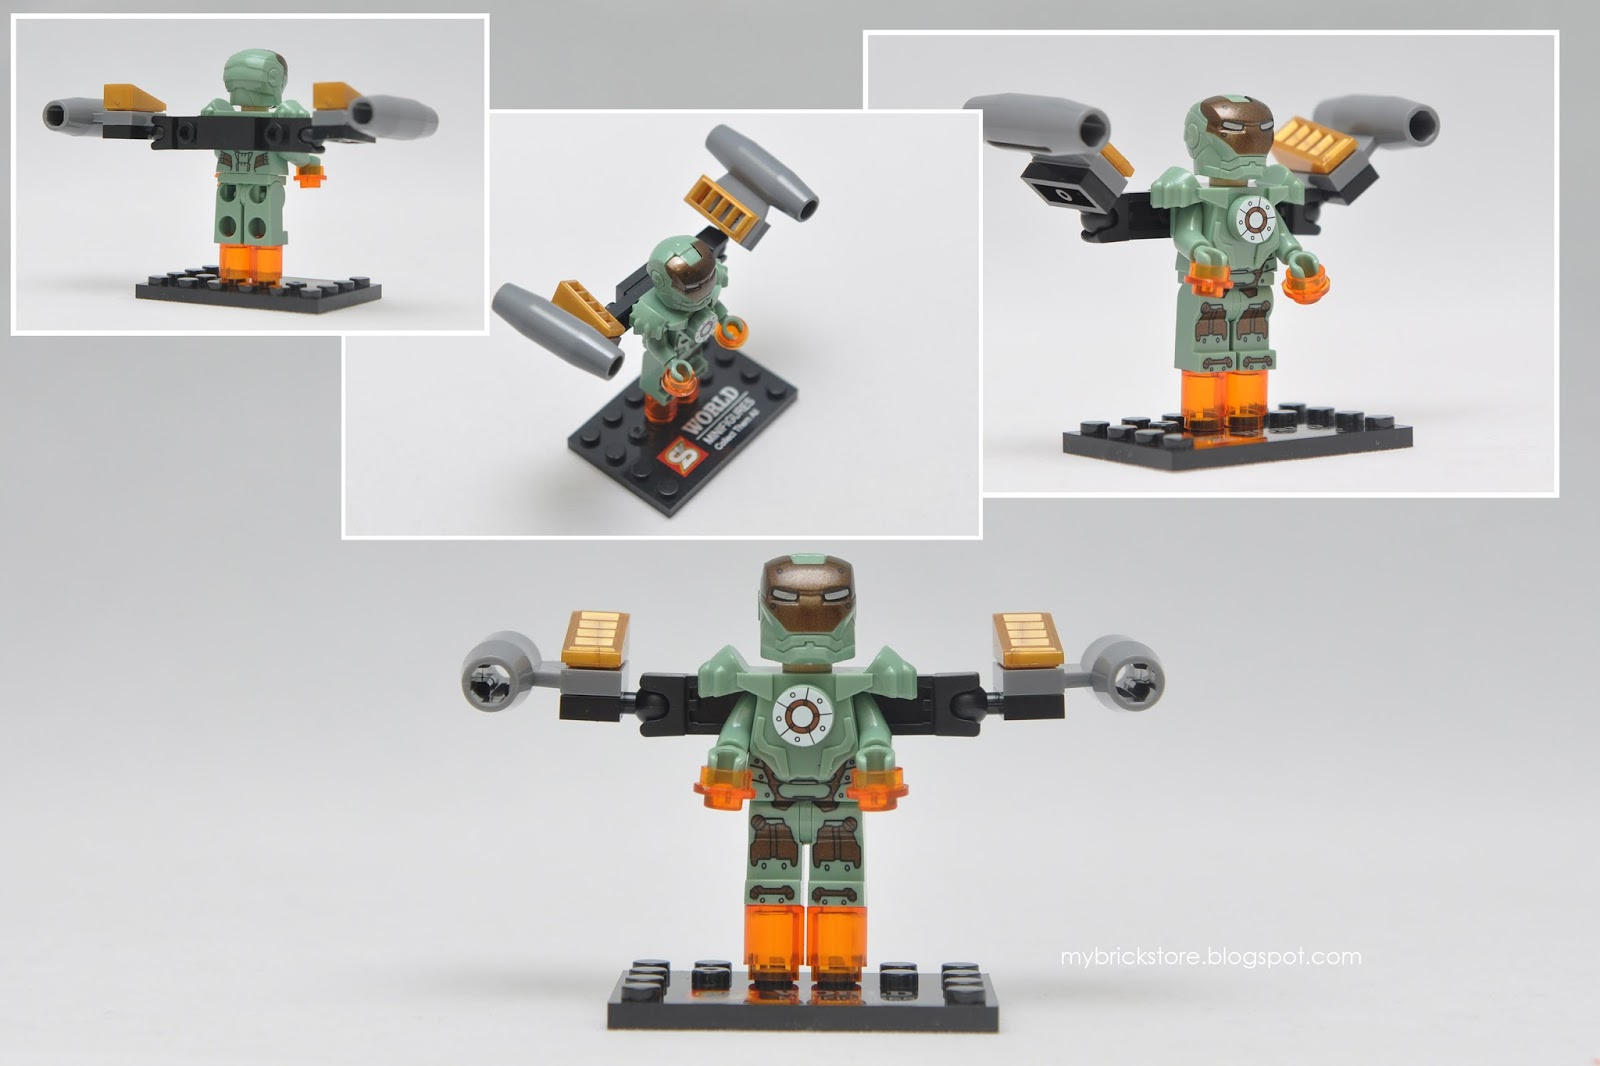 lego iron man mark 28 - photo #35